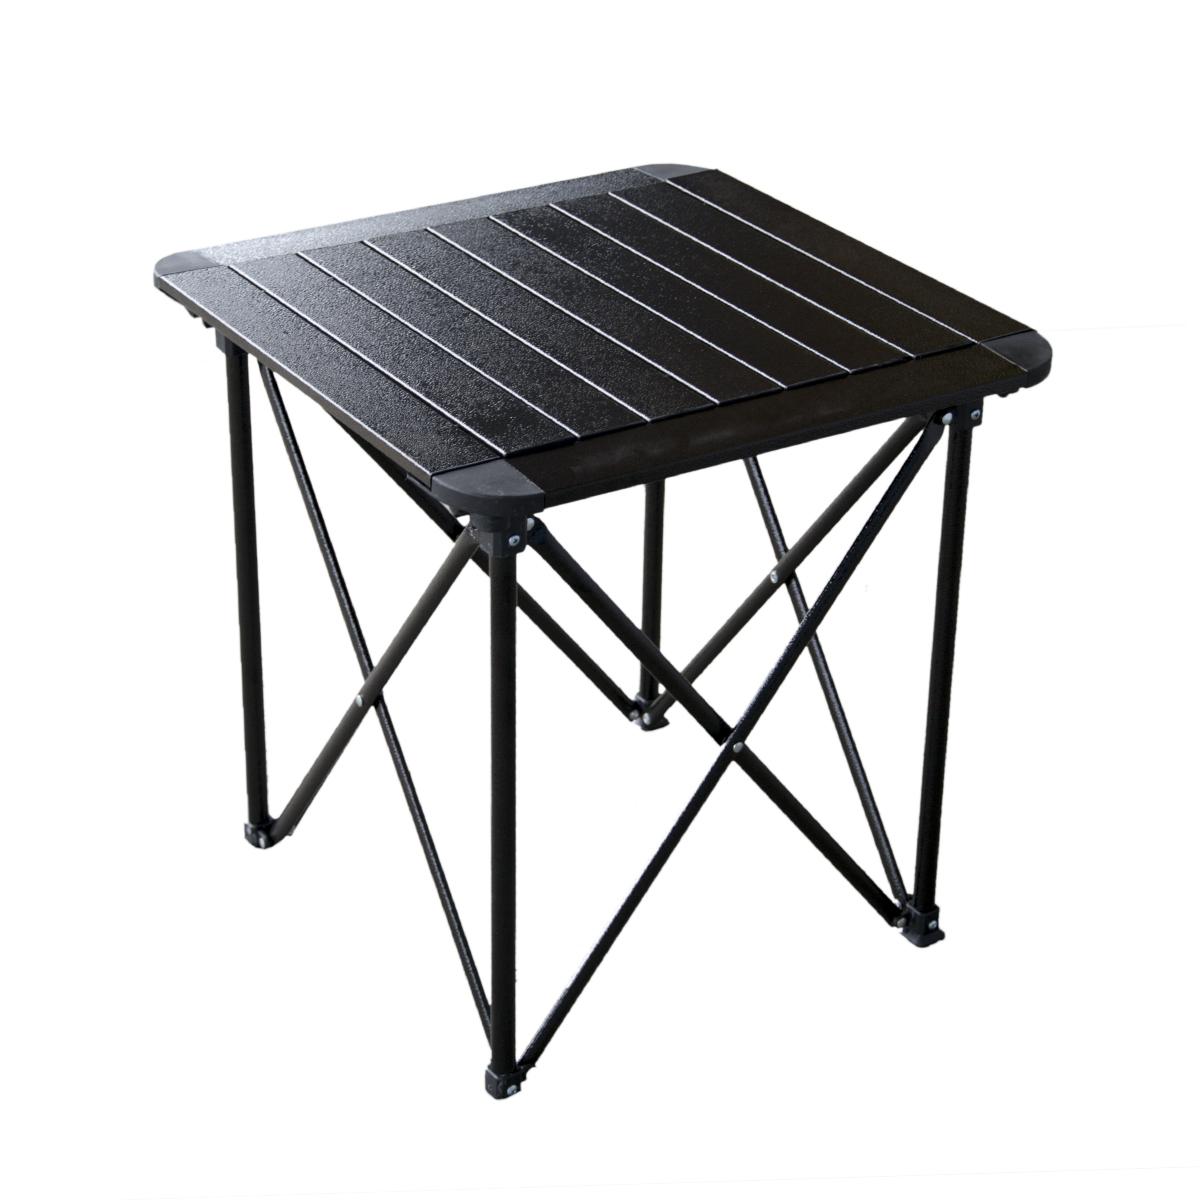 Camping stůl Alu 52 x 52 cm